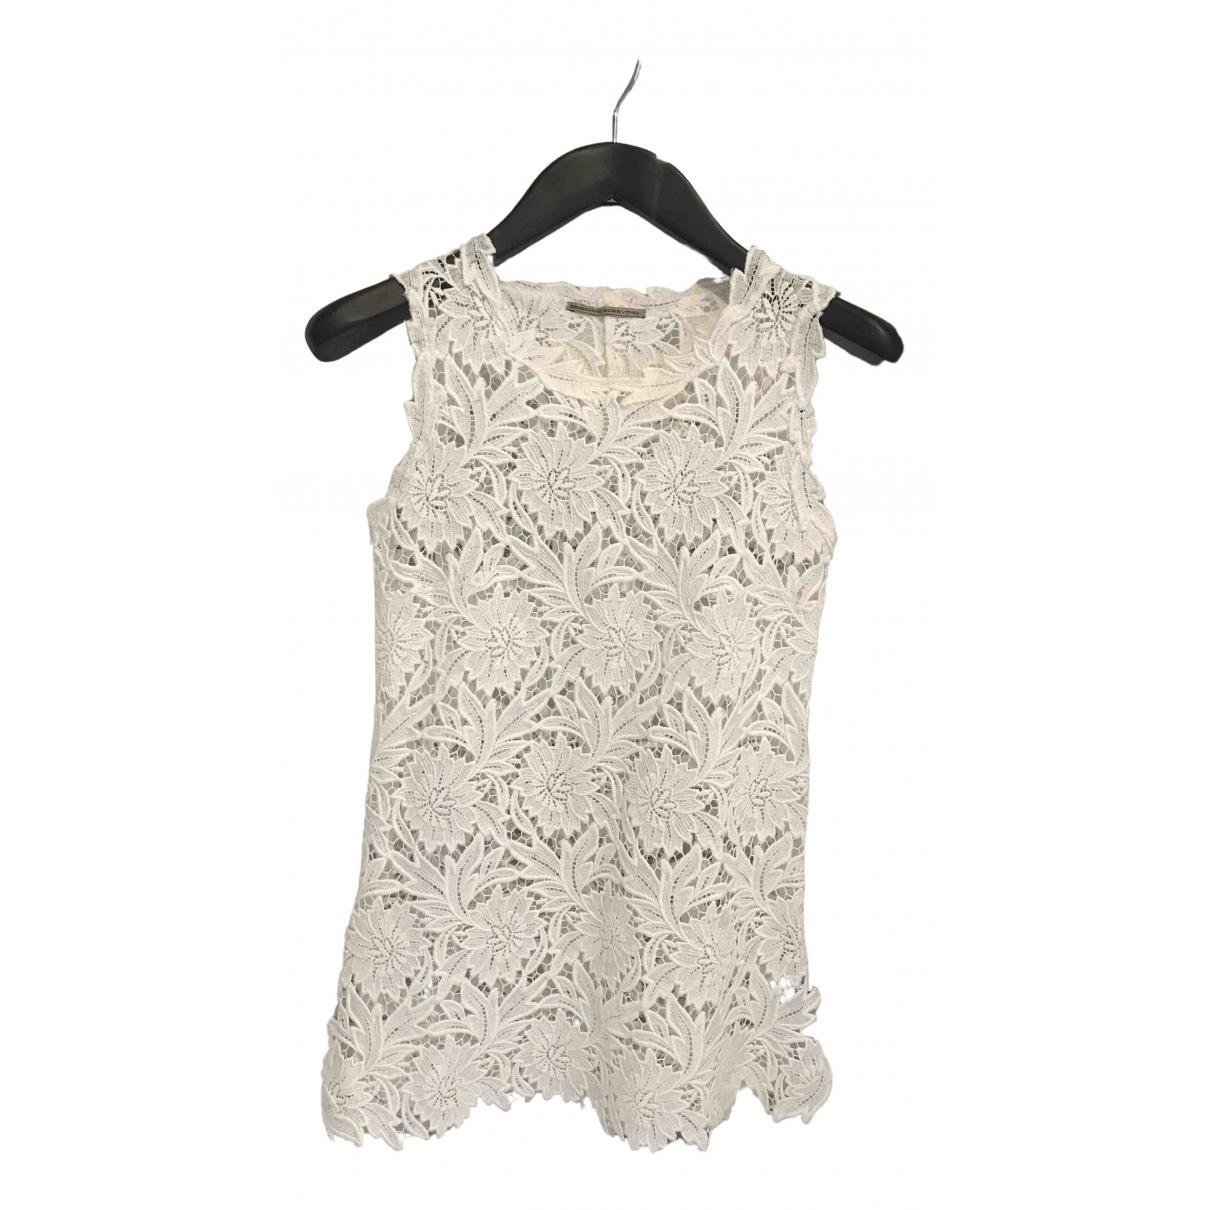 Ermanno Scervino N White Cotton Knitwear for Women 38 IT